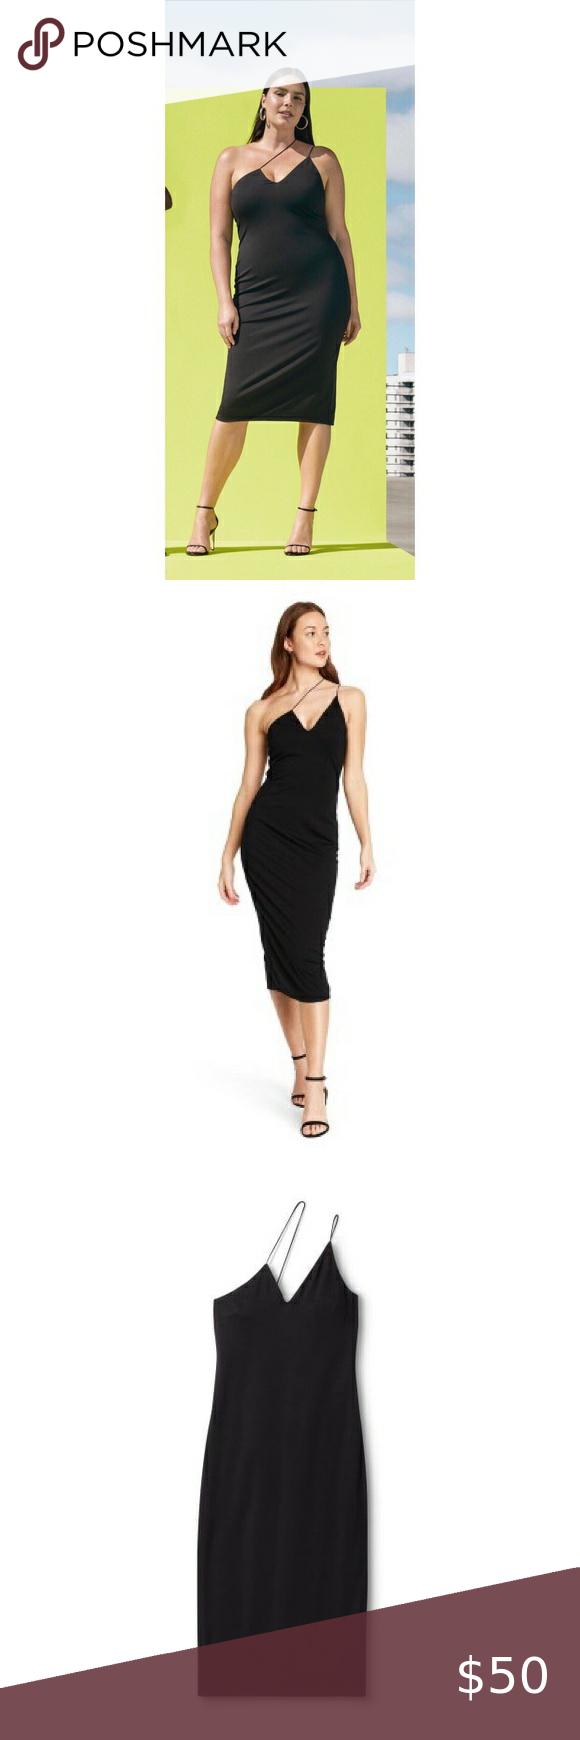 Cushnie For Target Black Body Con Dress V Neck Midi Dress Clothes Design Black Bodycon Dress [ 1740 x 580 Pixel ]